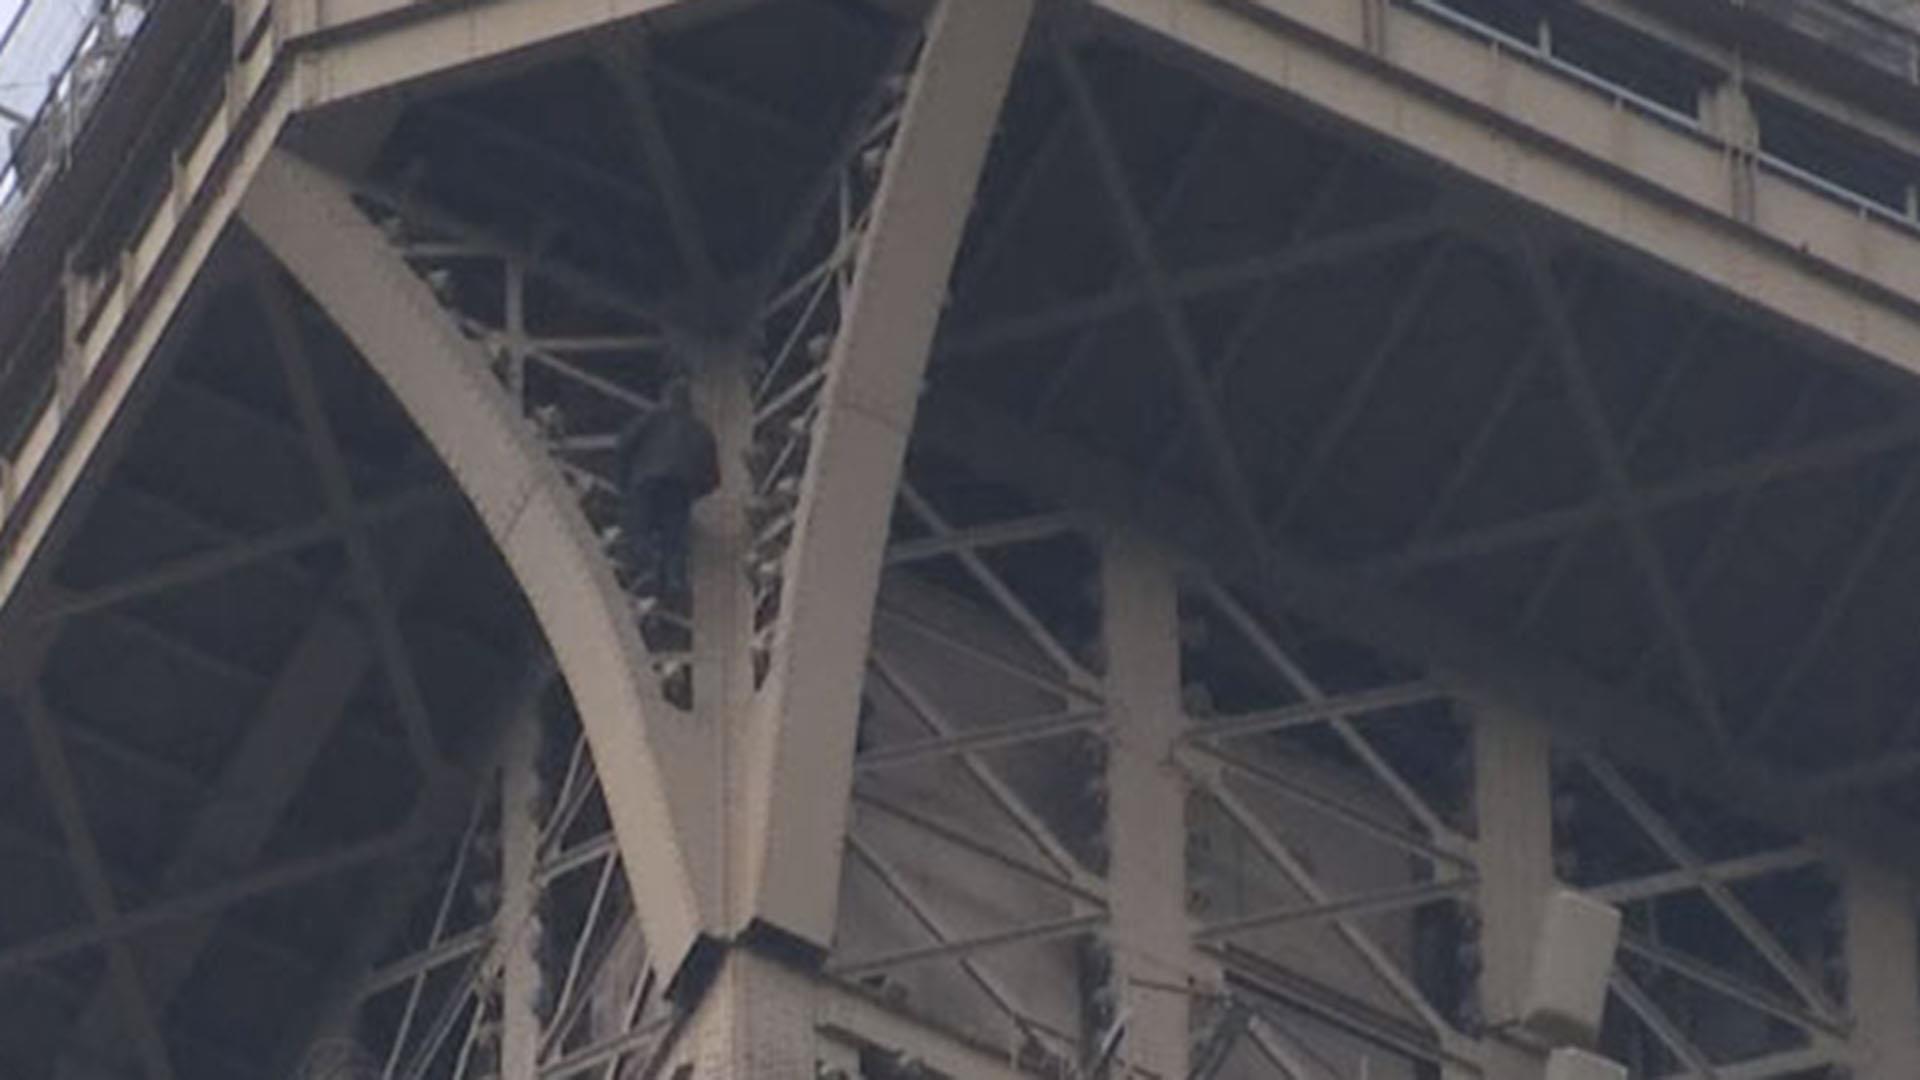 Police swarm Eiffel Tower as man climbs the Paris landmark